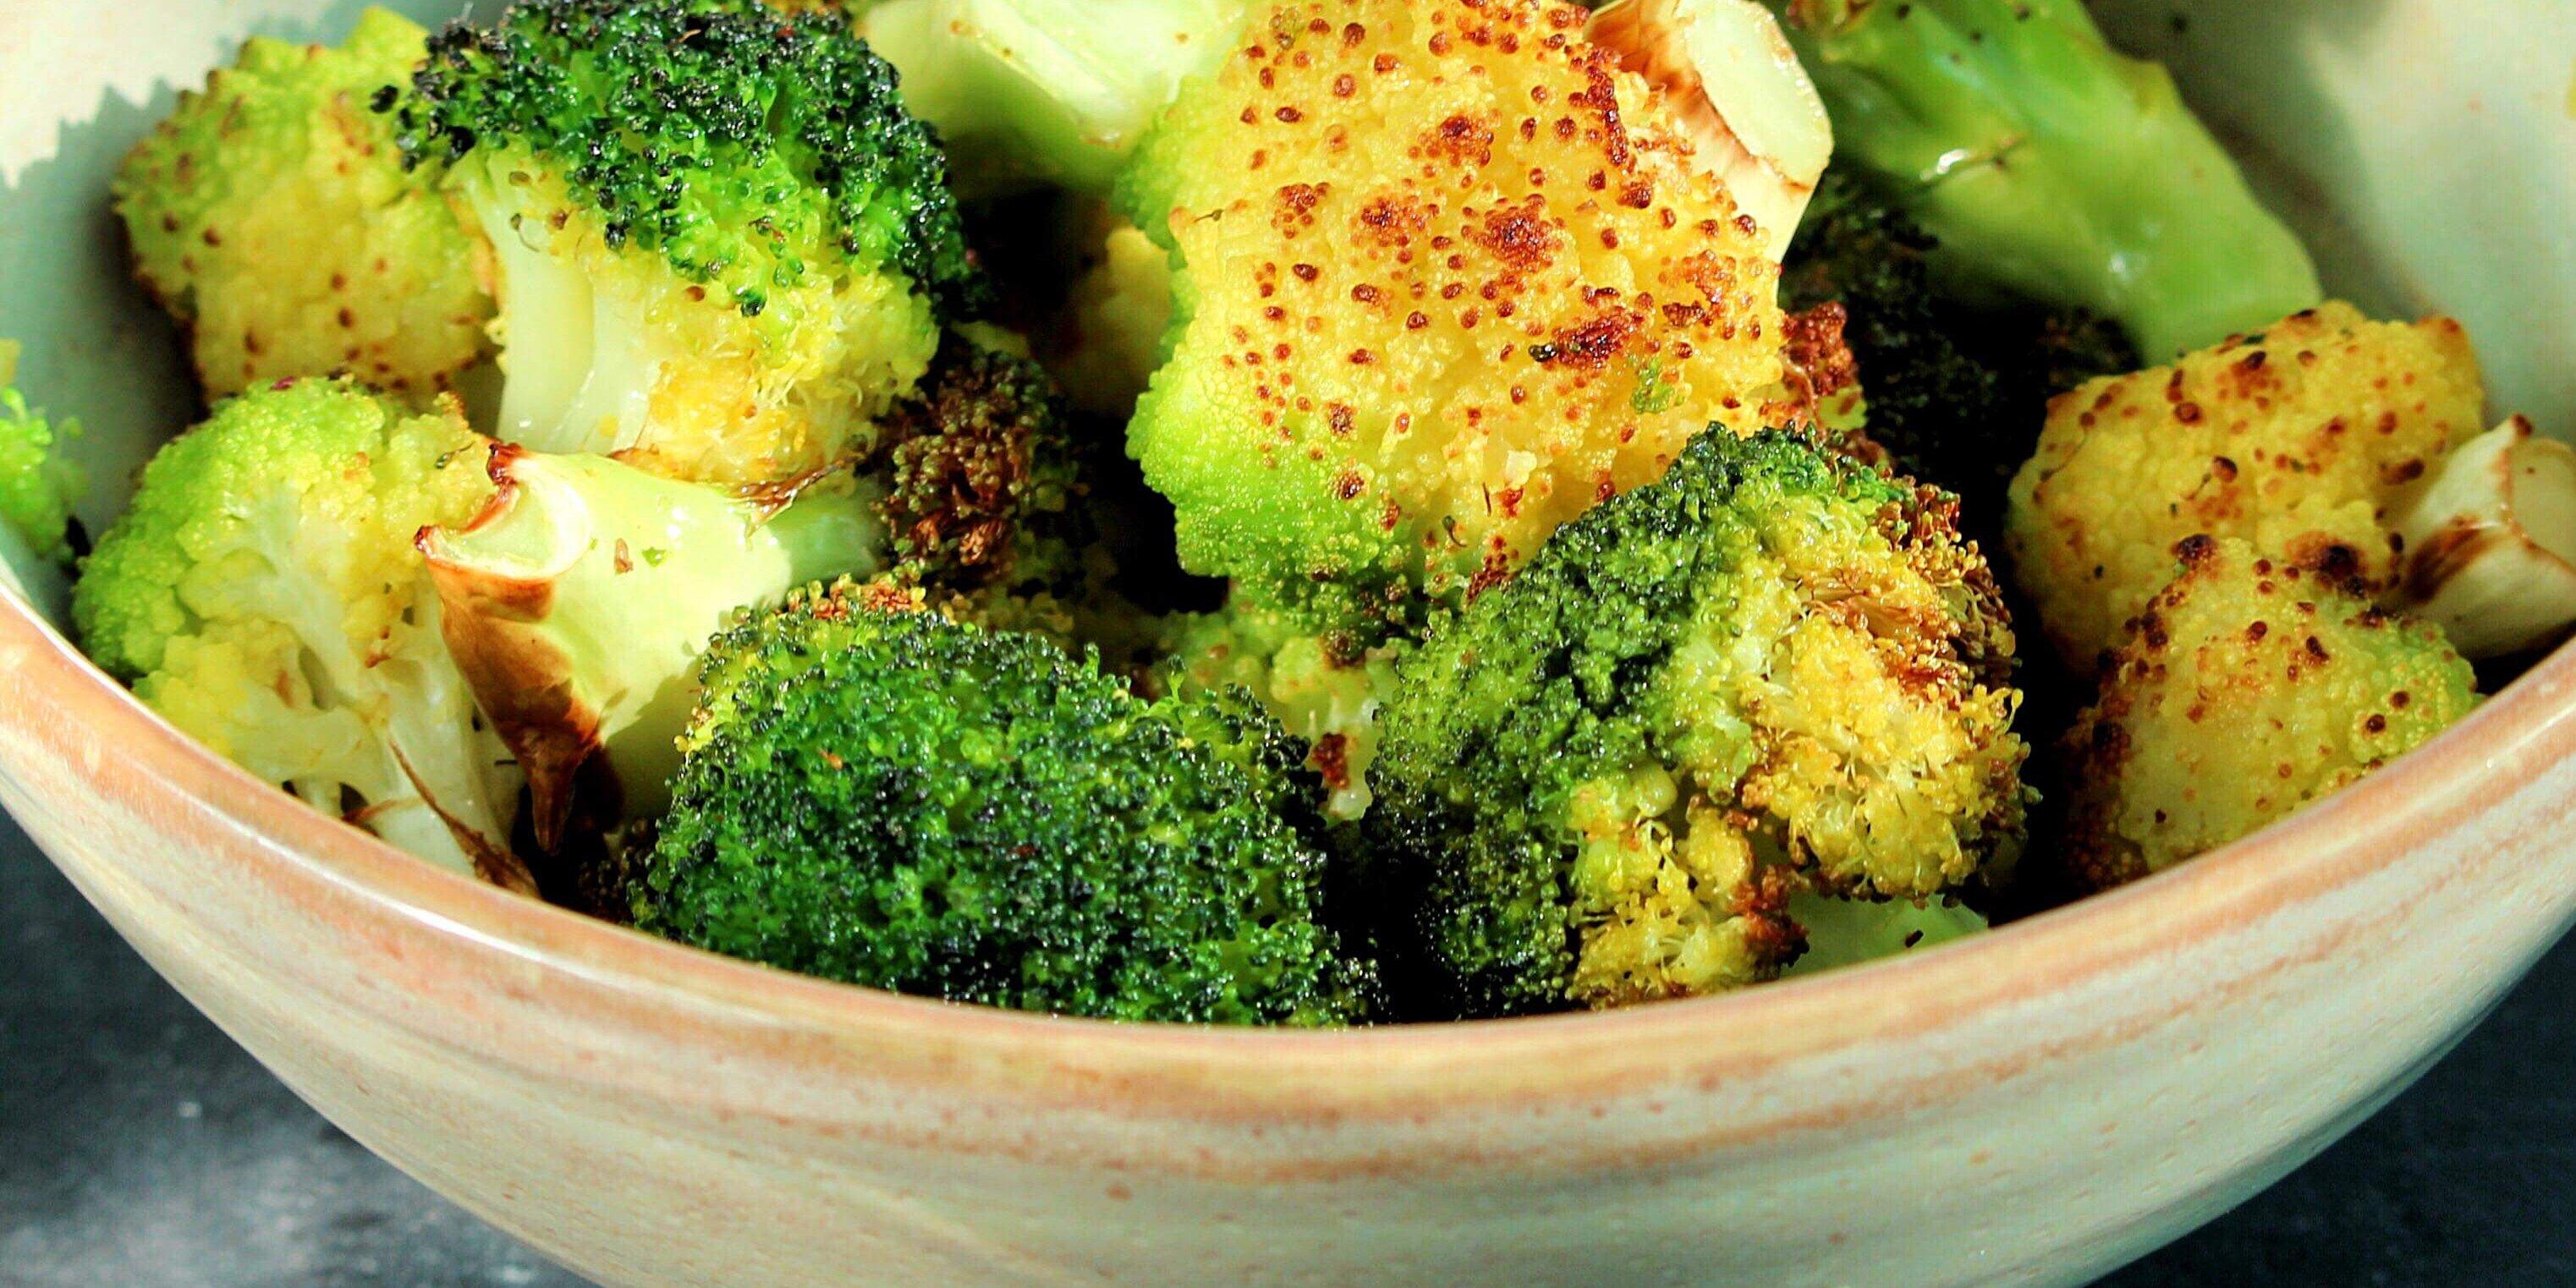 air fryer roasted broccoli and cauliflower recipe